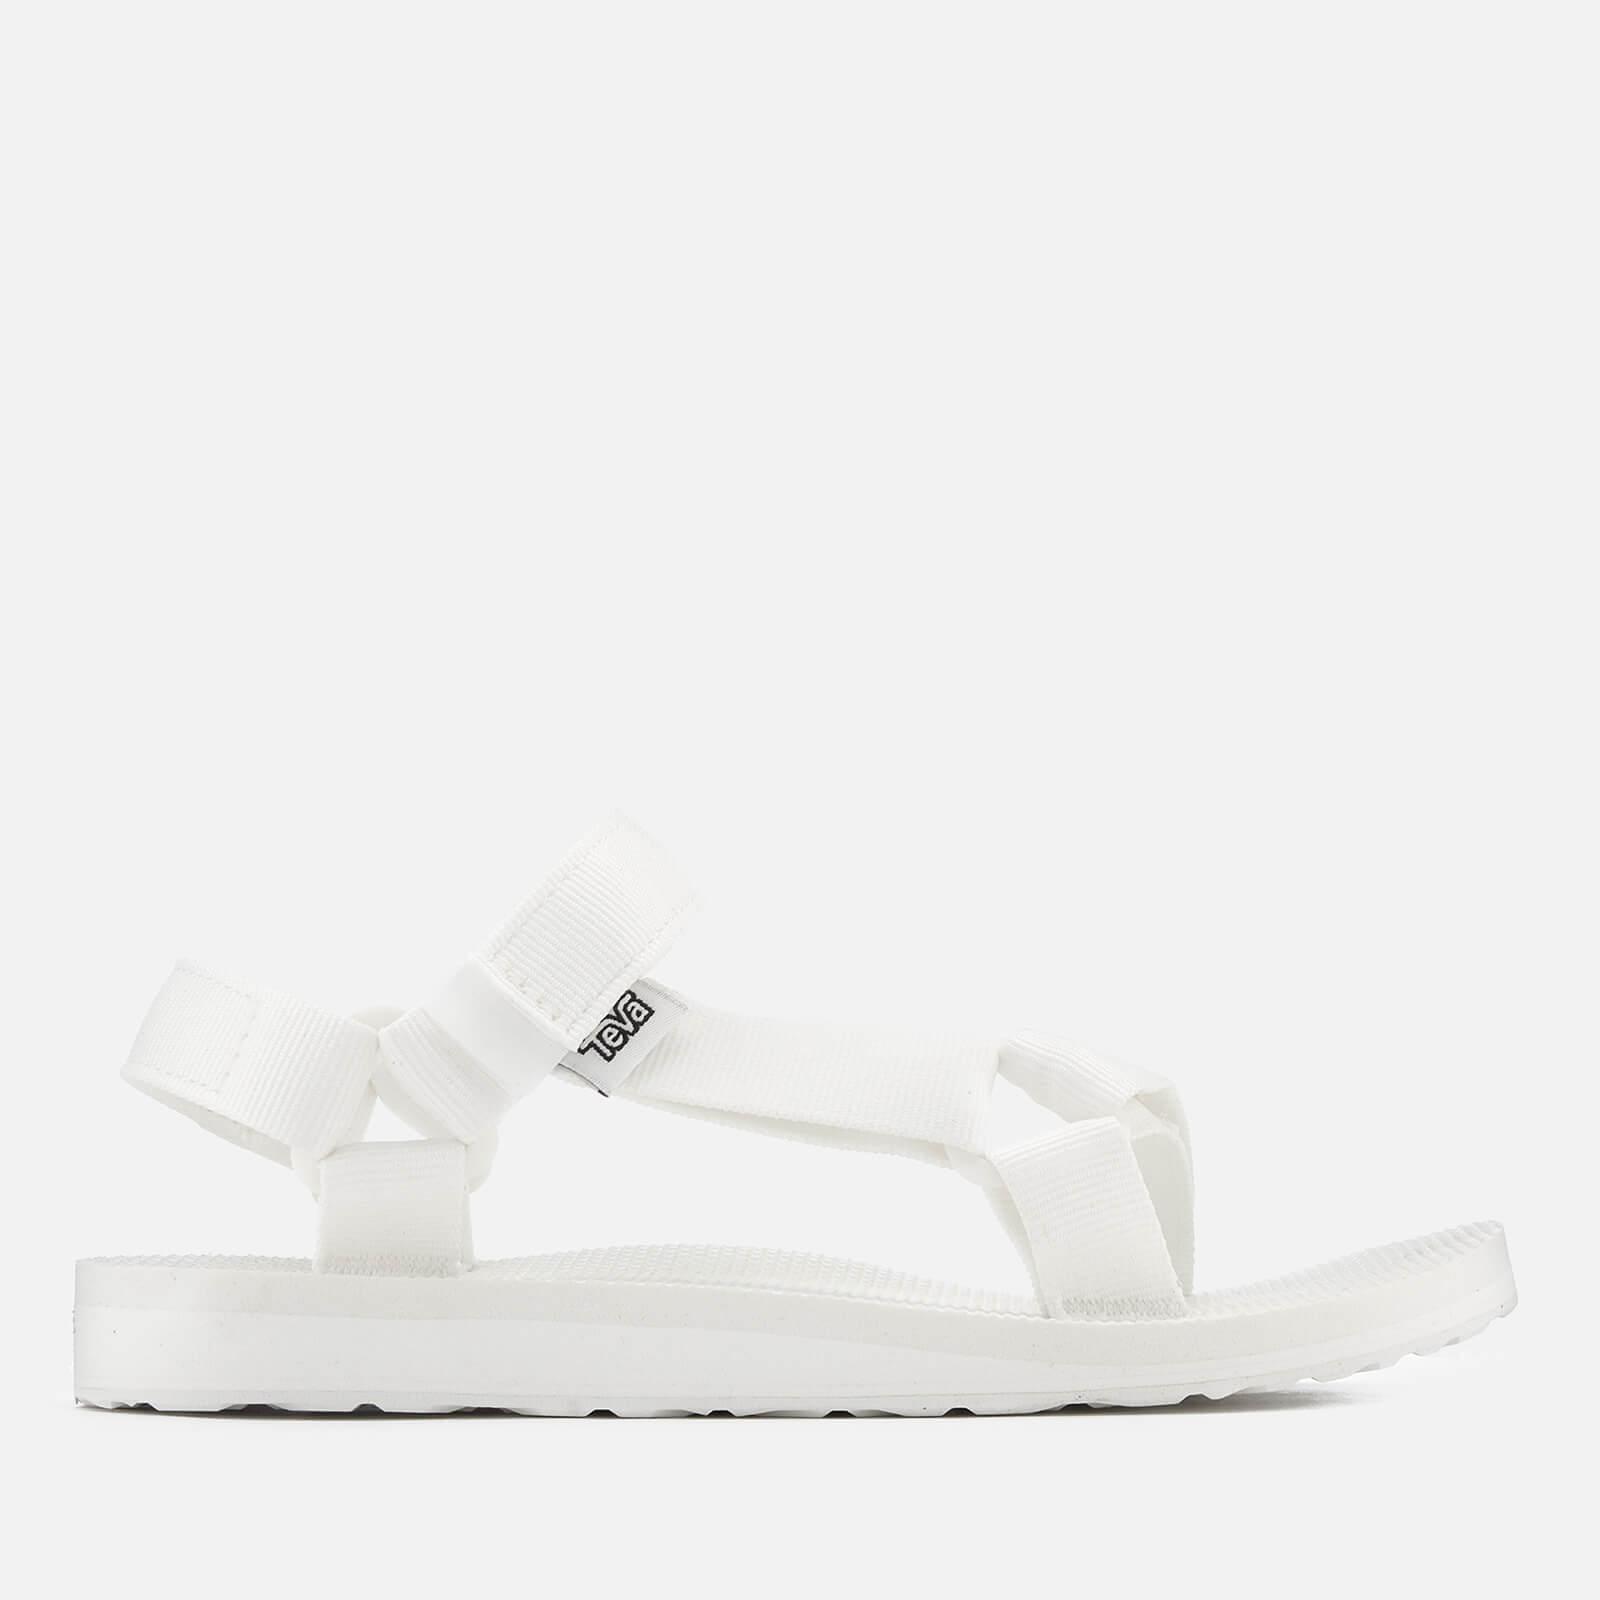 Teva Women's Original Universal Sport Sandals - Bright White - UK 8